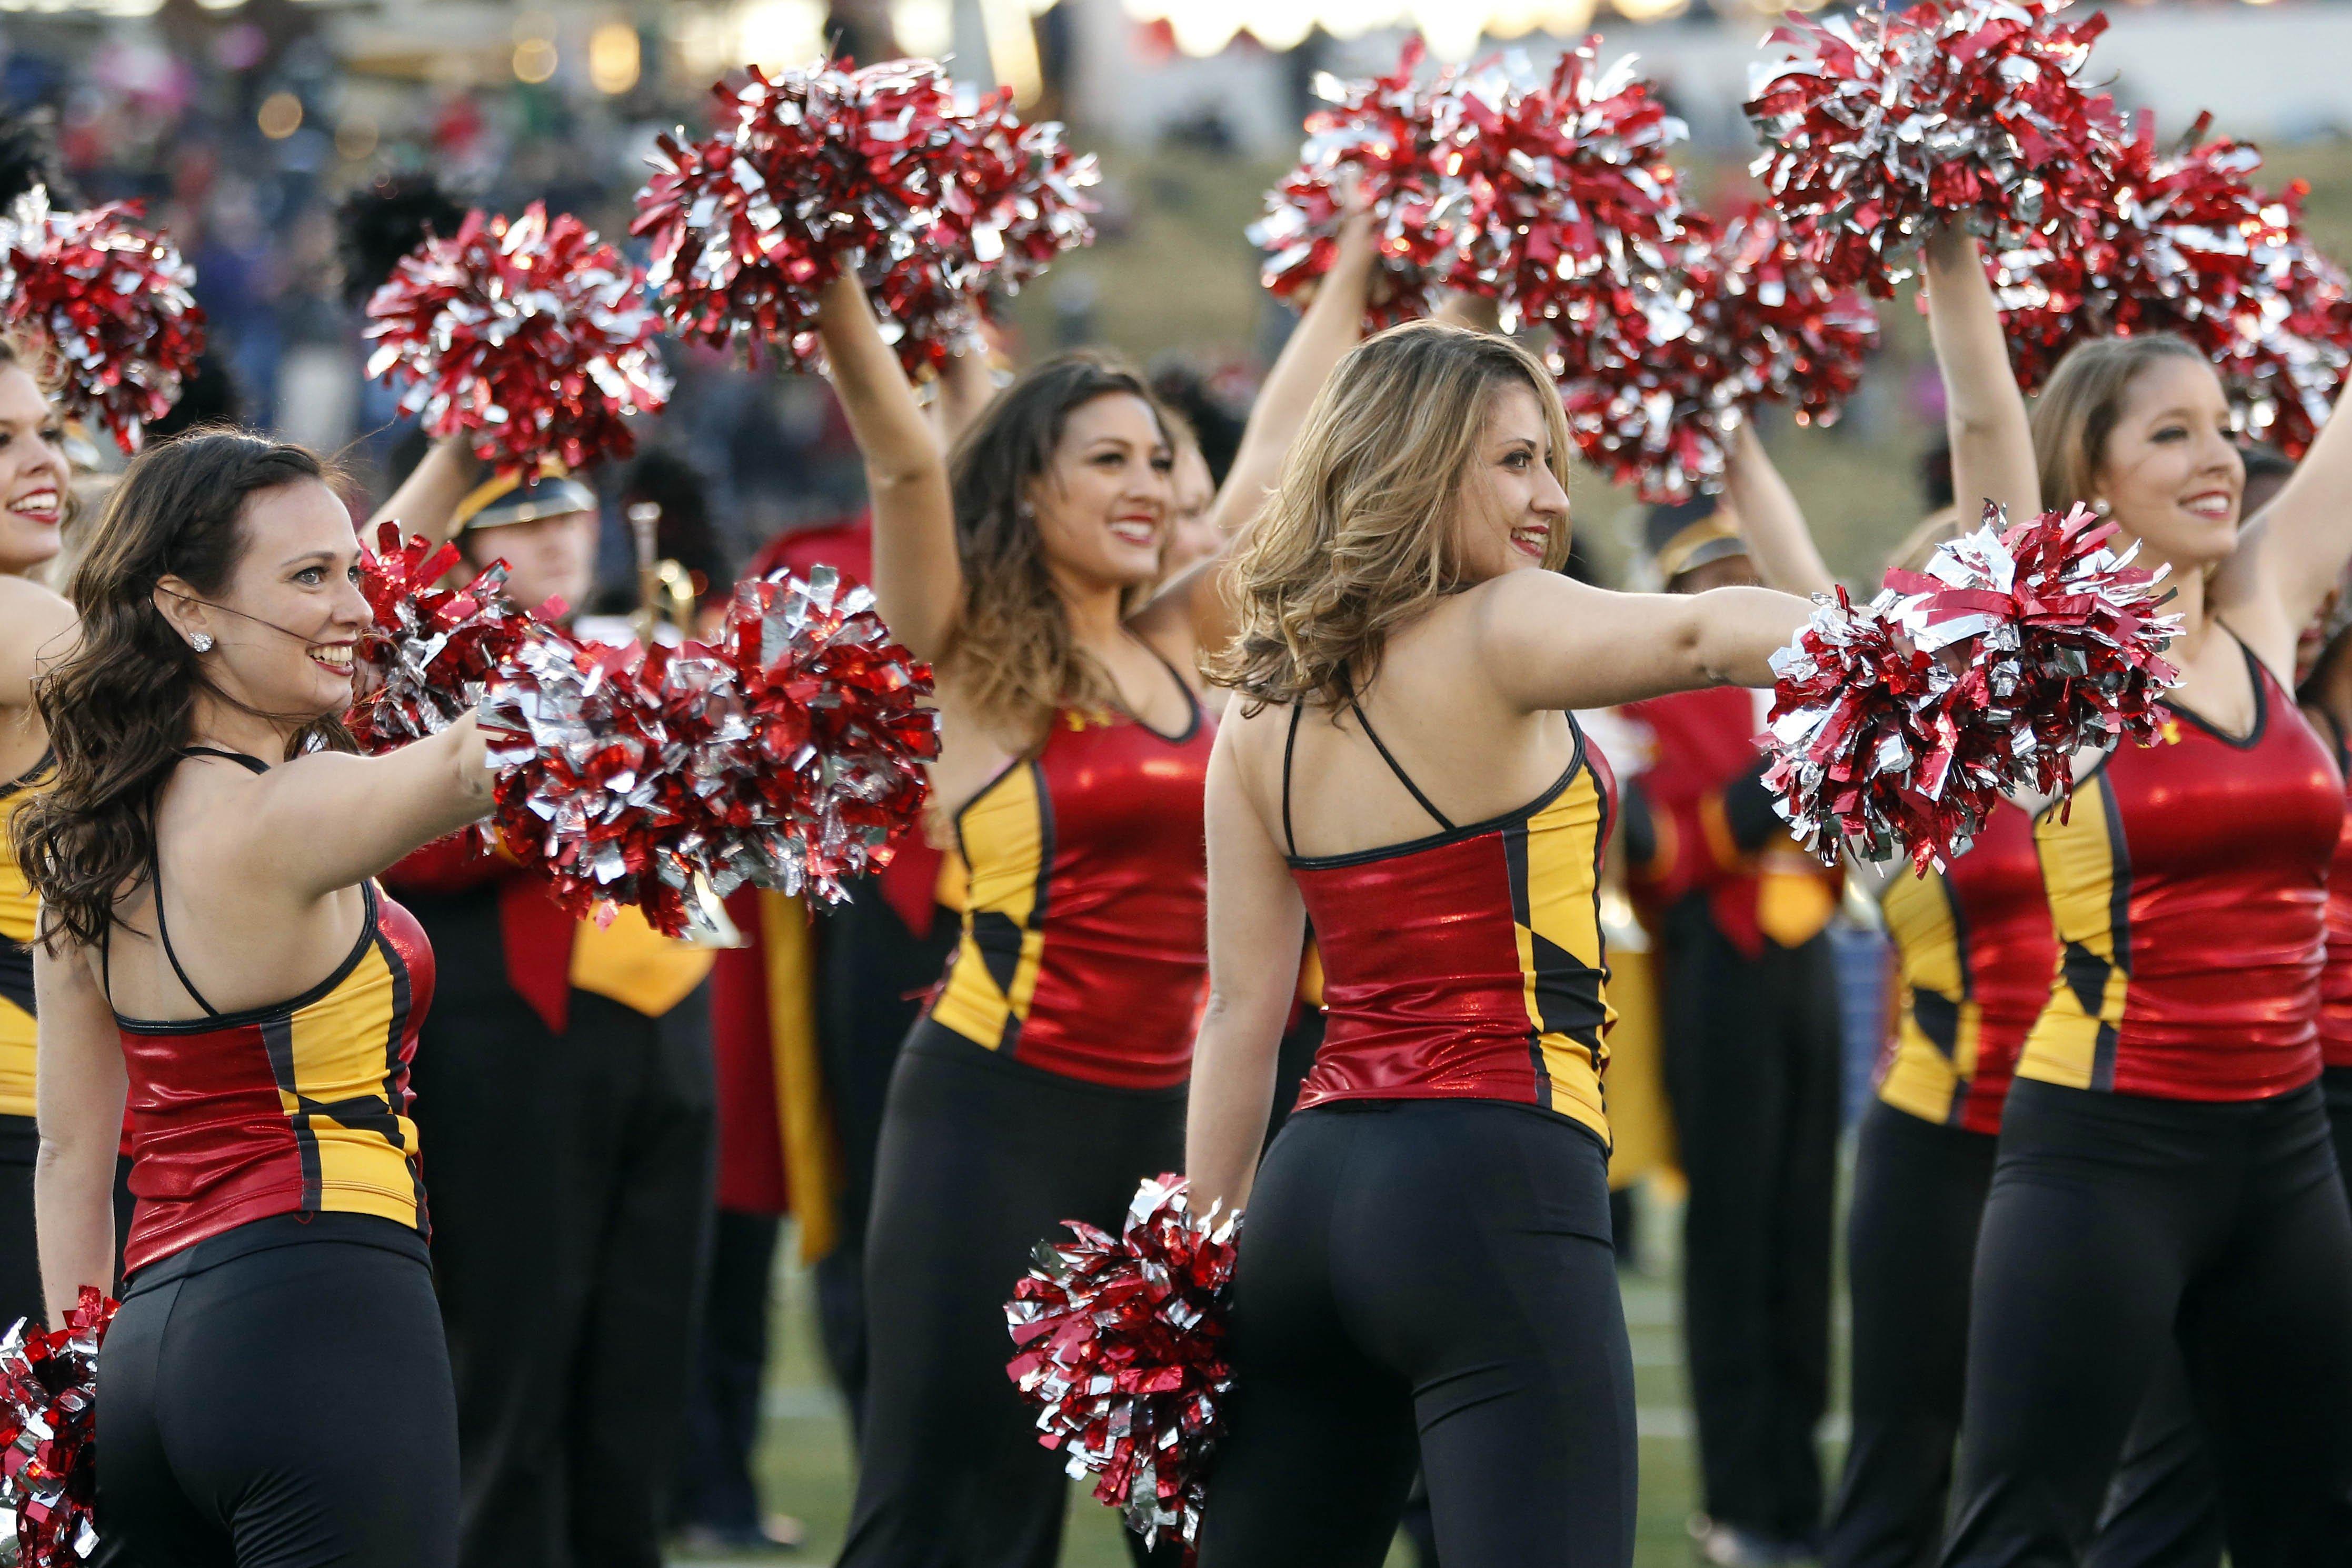 MARYLAND TERRAPINS college football cheerleader wallpaper background 4468x2979